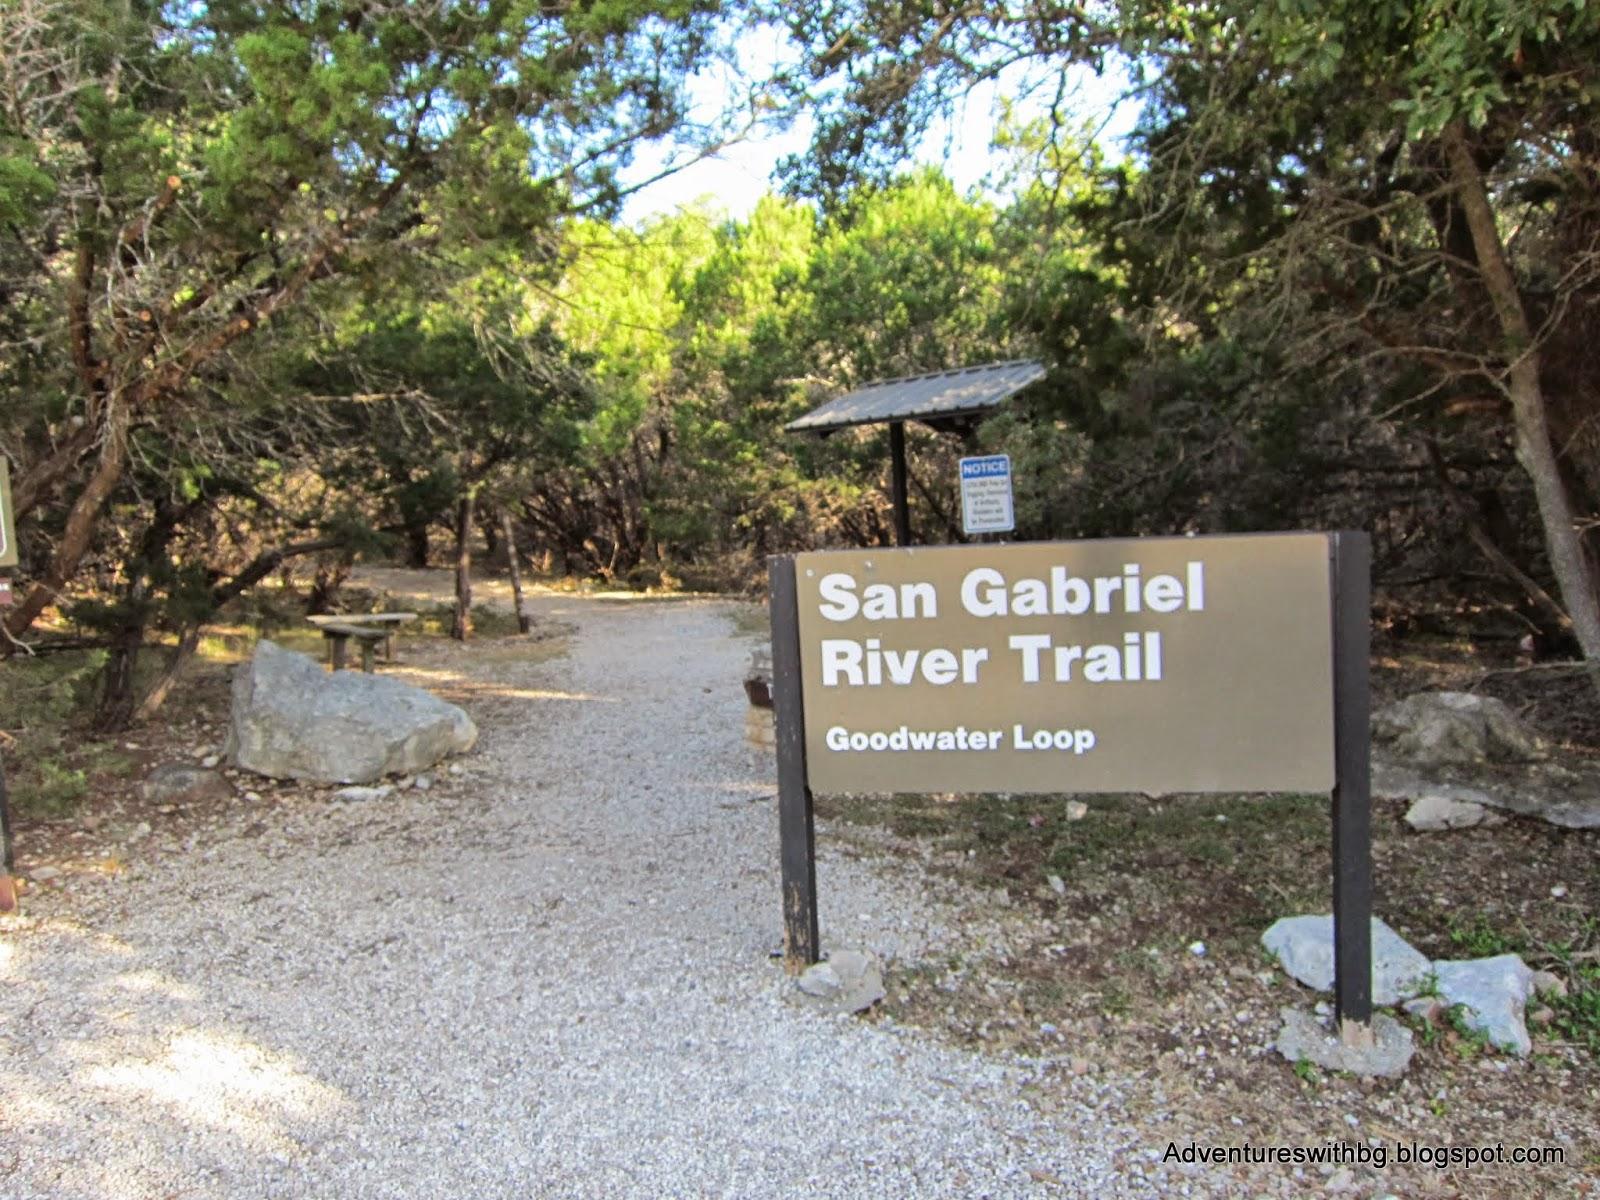 An amazing hiking, backpacking, or mountain biking trail